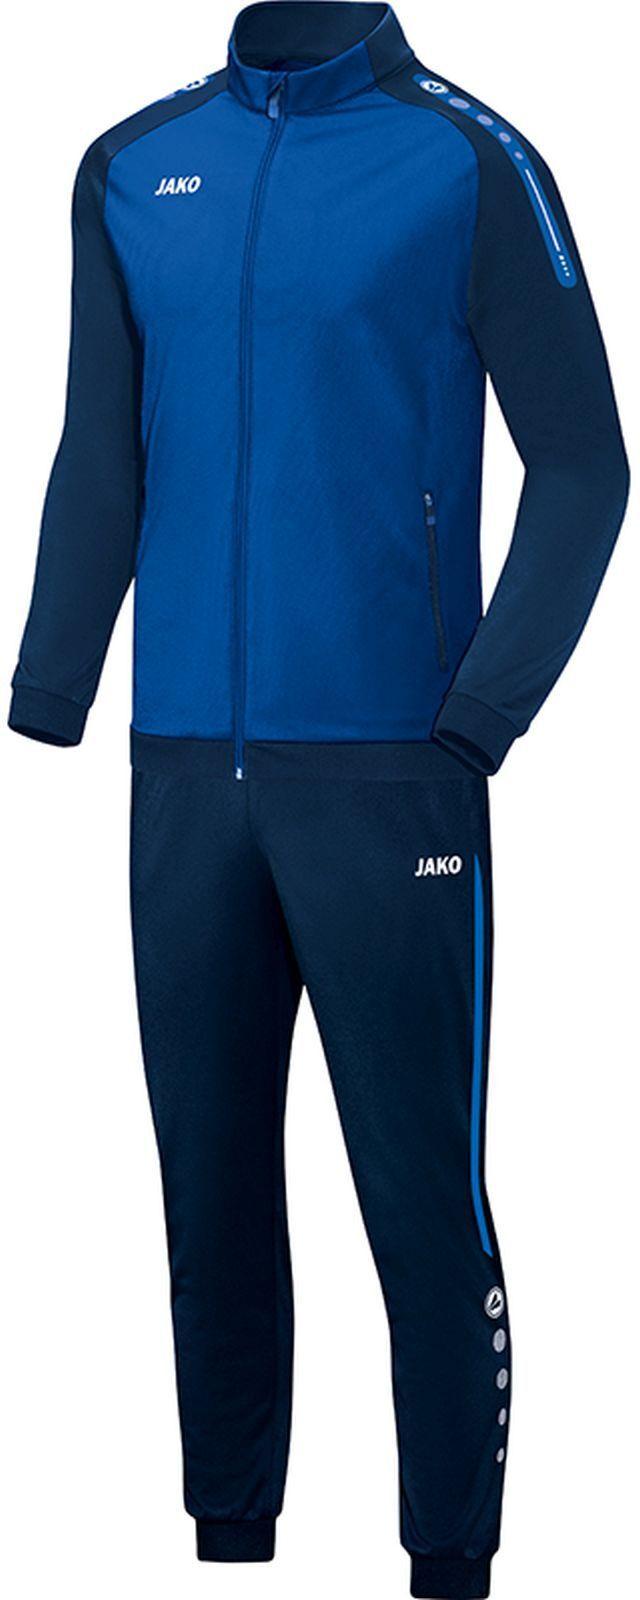 Jako Trainingsanzug Jogginganzug Champ Champ Champ Gr.S Gr.M Gr.L Gr.XL Gr.XXL Gr.3XL Gr.4XL 405a08